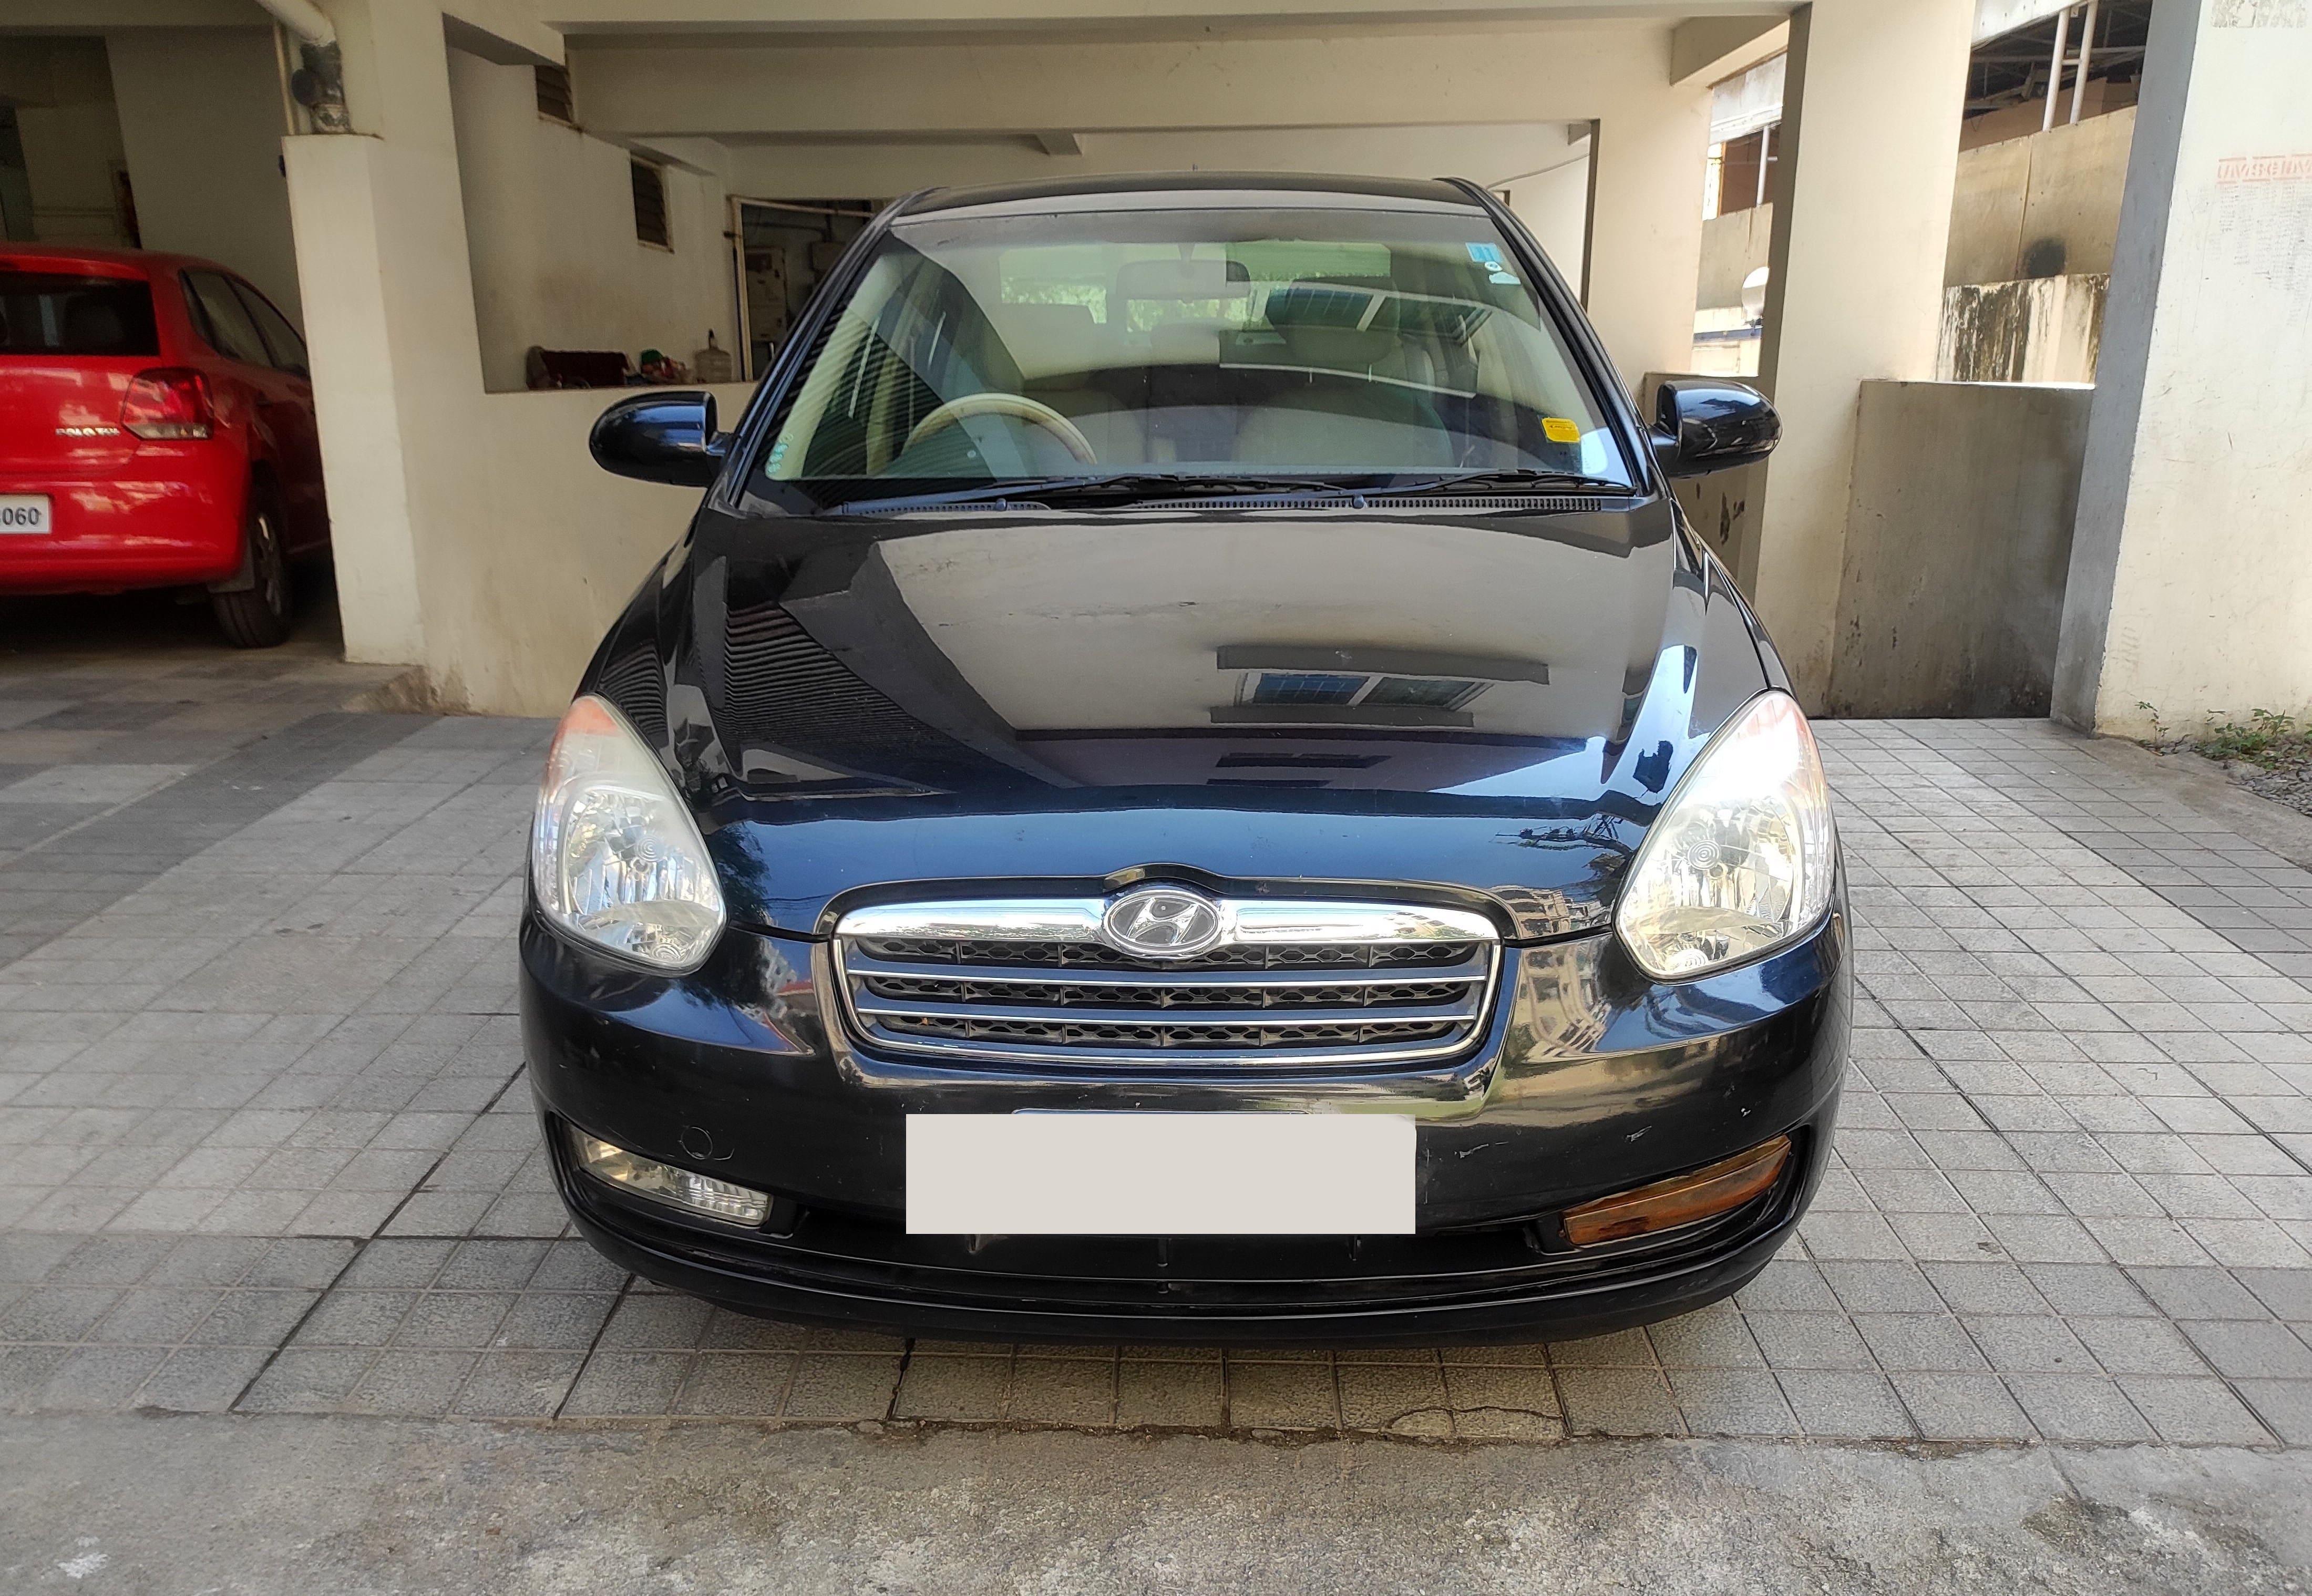 Hyundai Verna 2006-2009 CRDi SX ABS